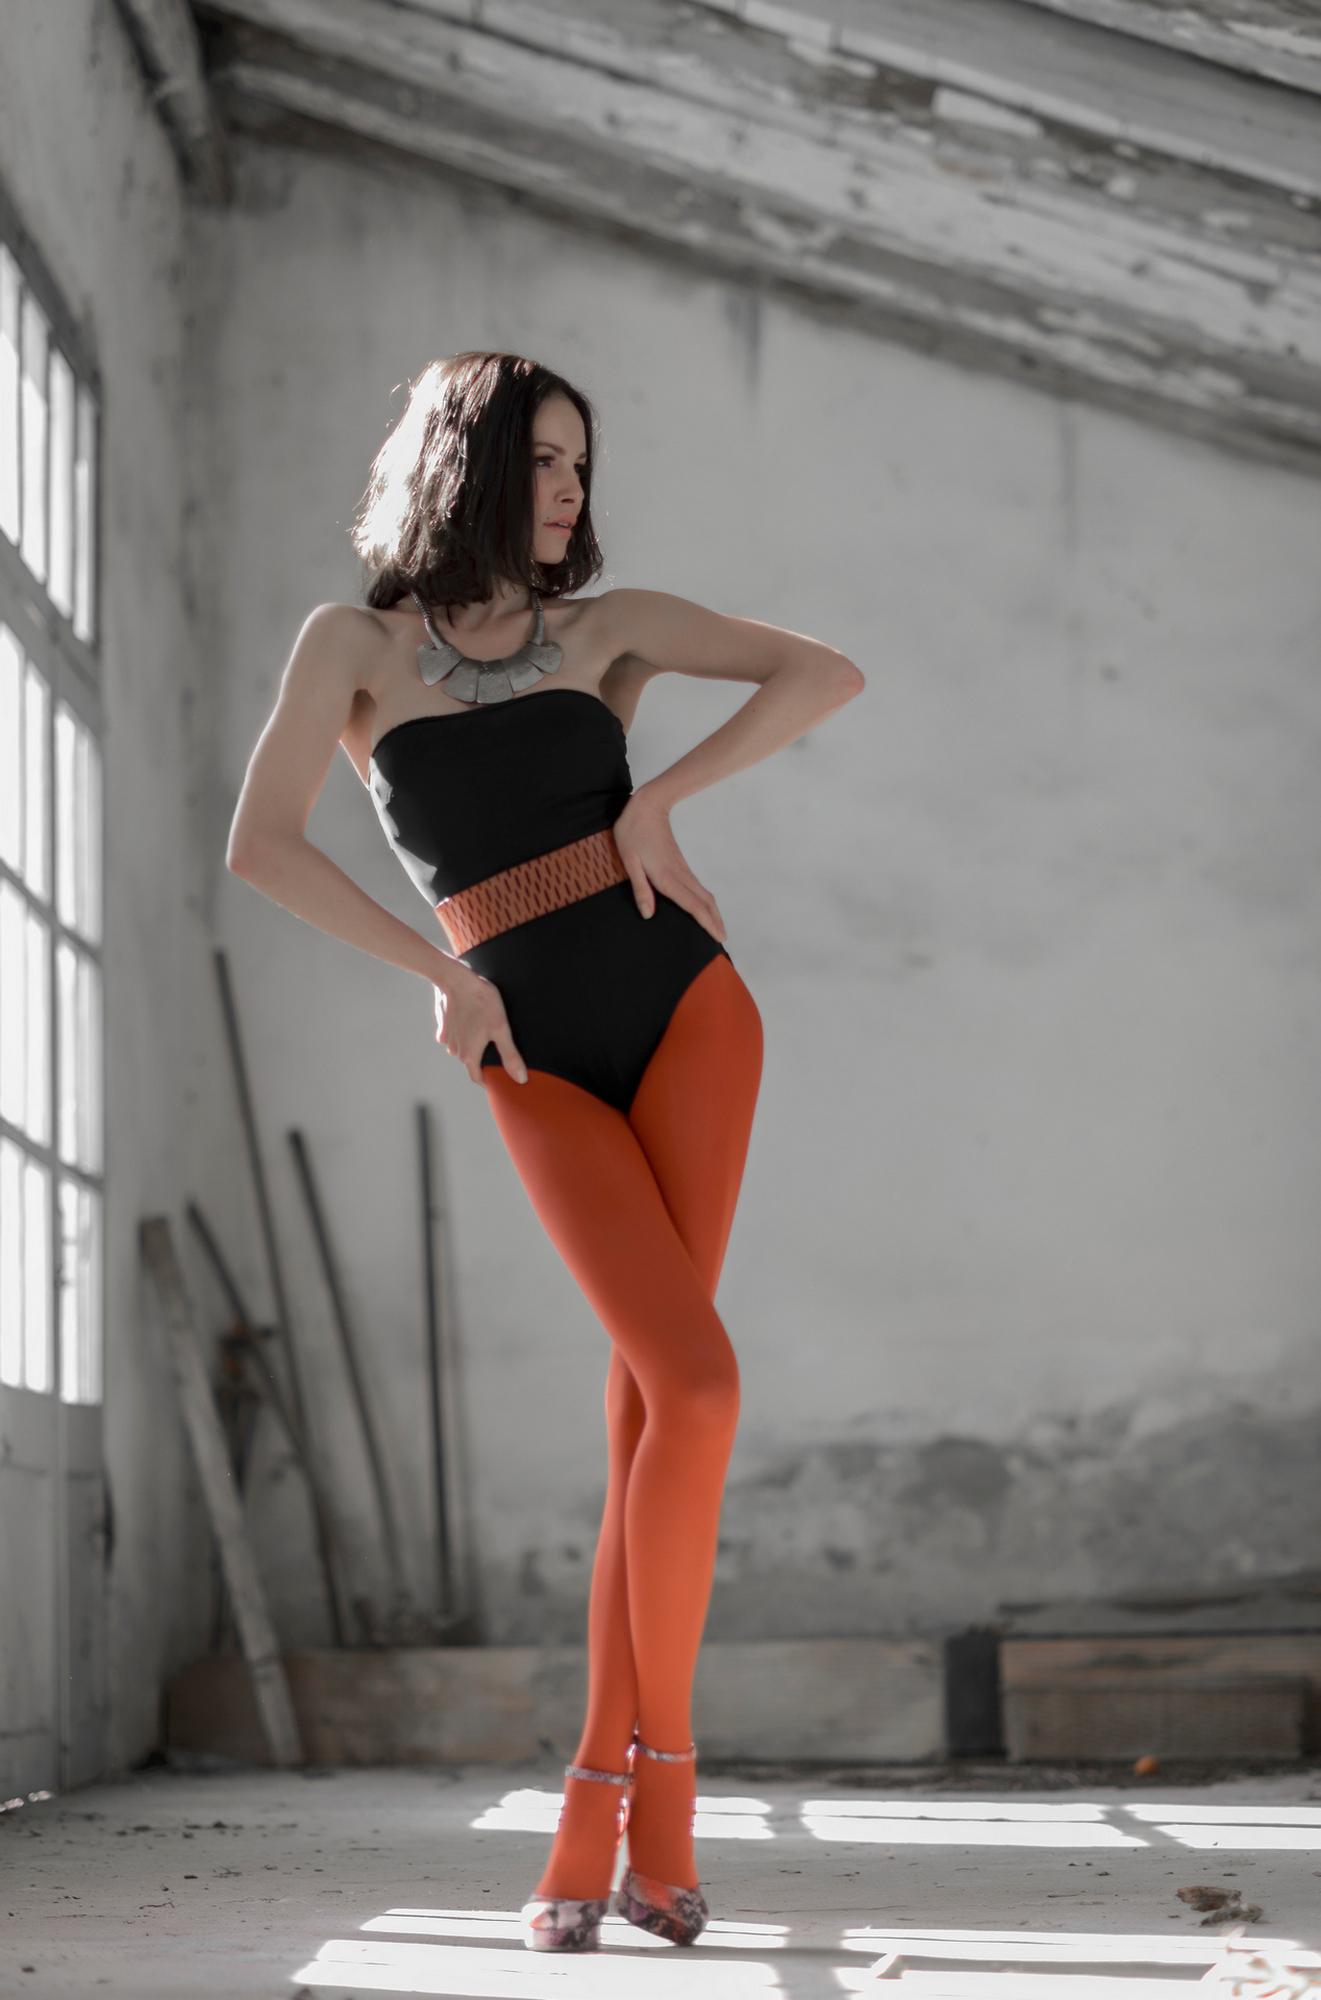 Maria Michaela Crisan